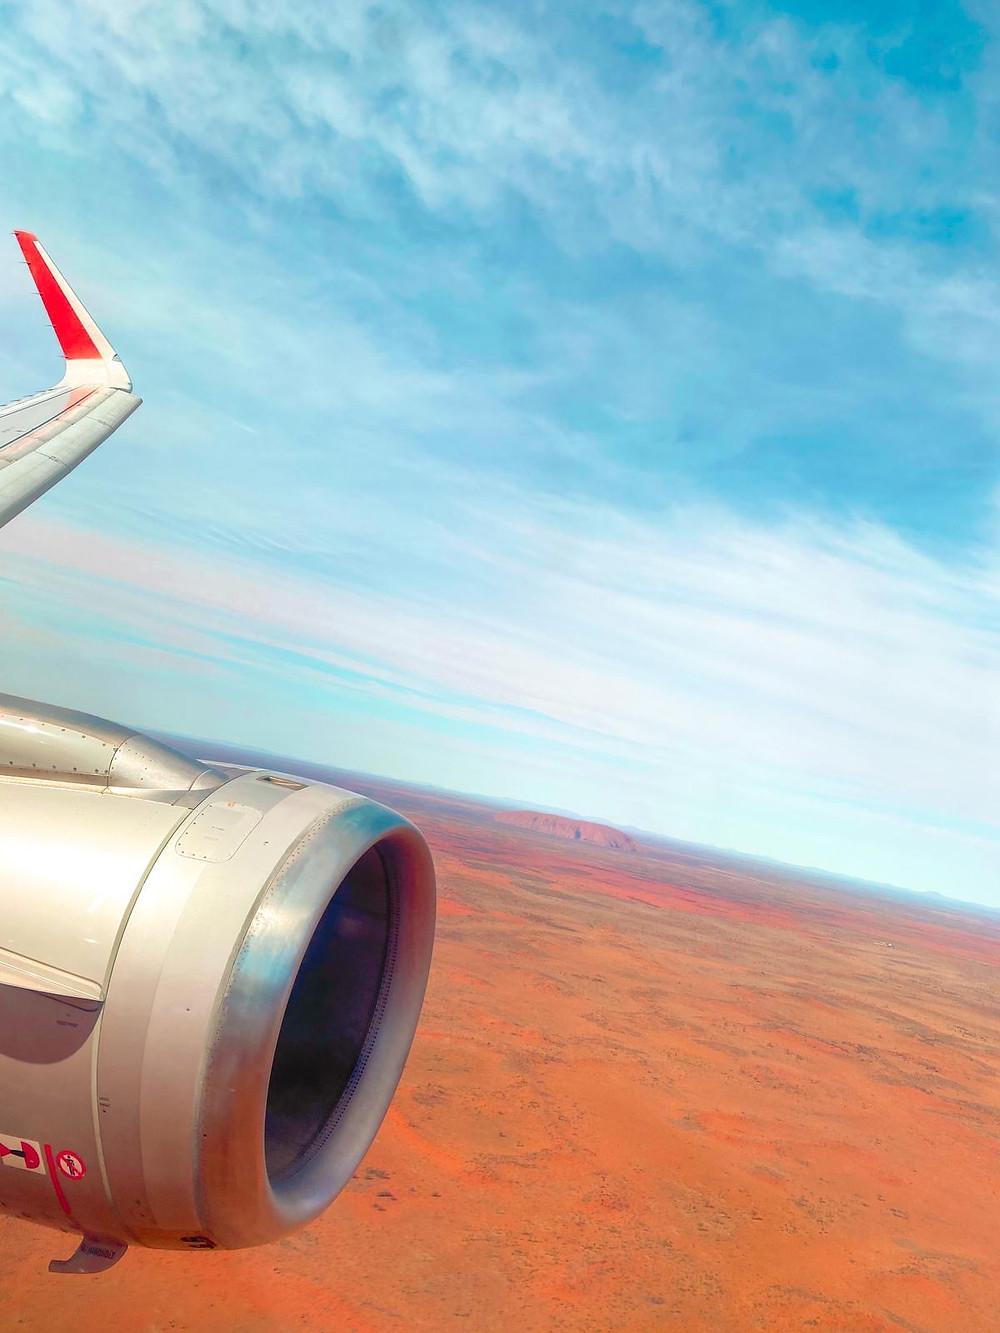 Jetstar Brisbane to Uluru Ayres Rock